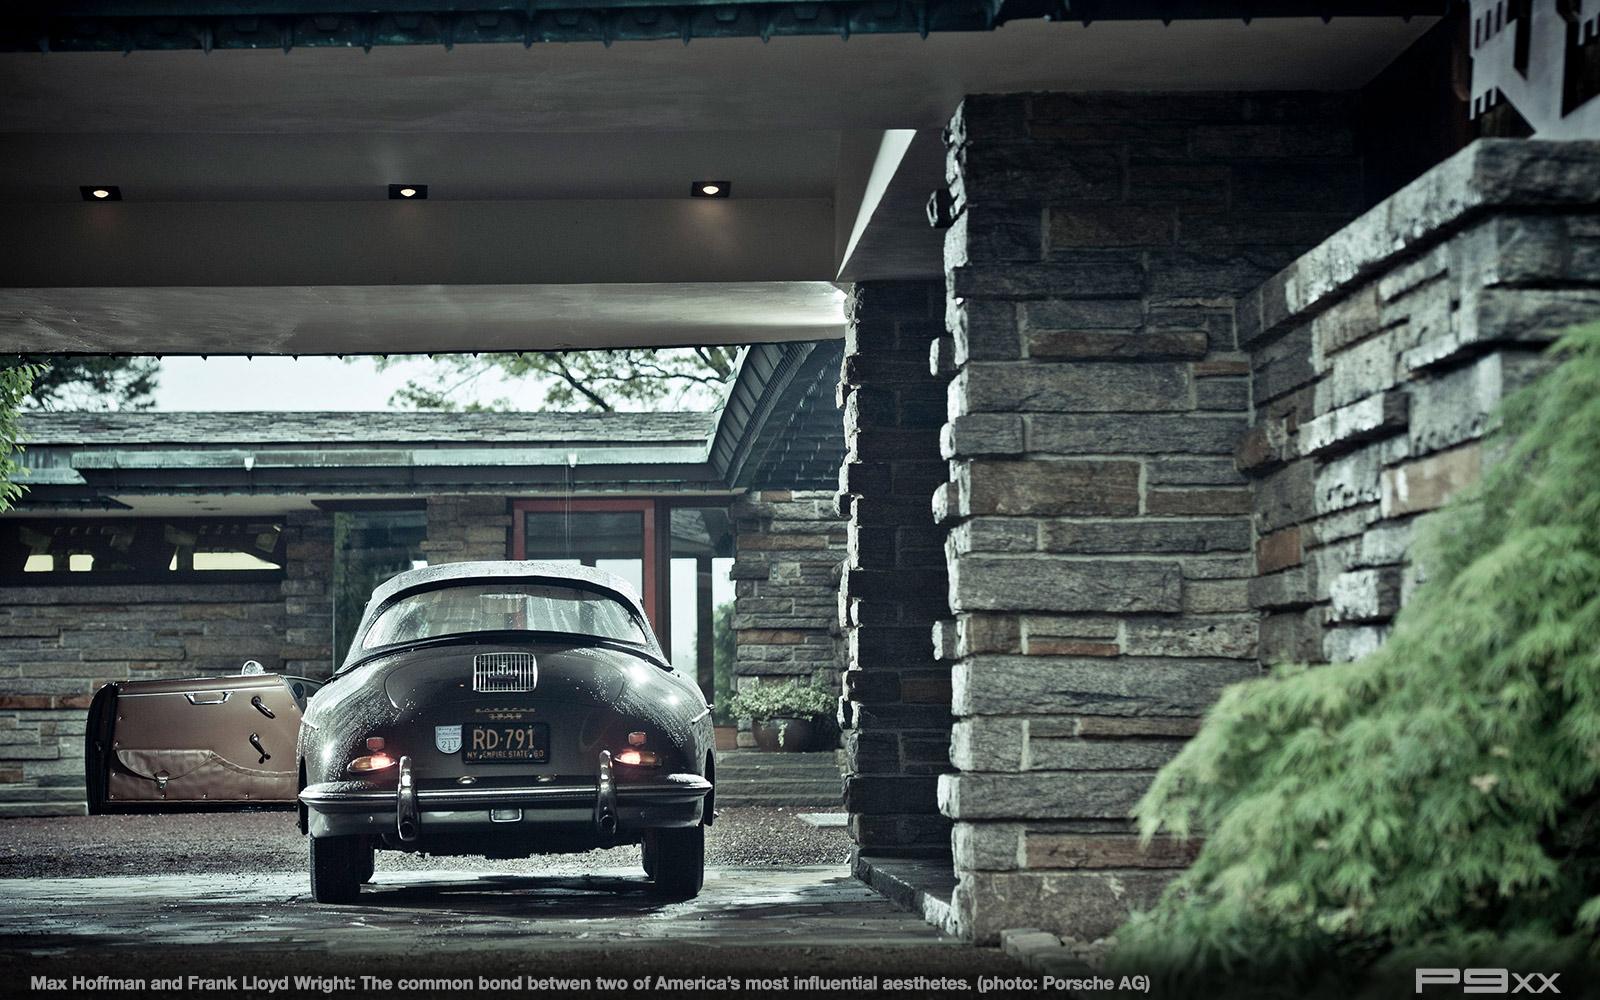 Max-Hoffman-Frank-Lloyd-Wright-Porsche-356-326